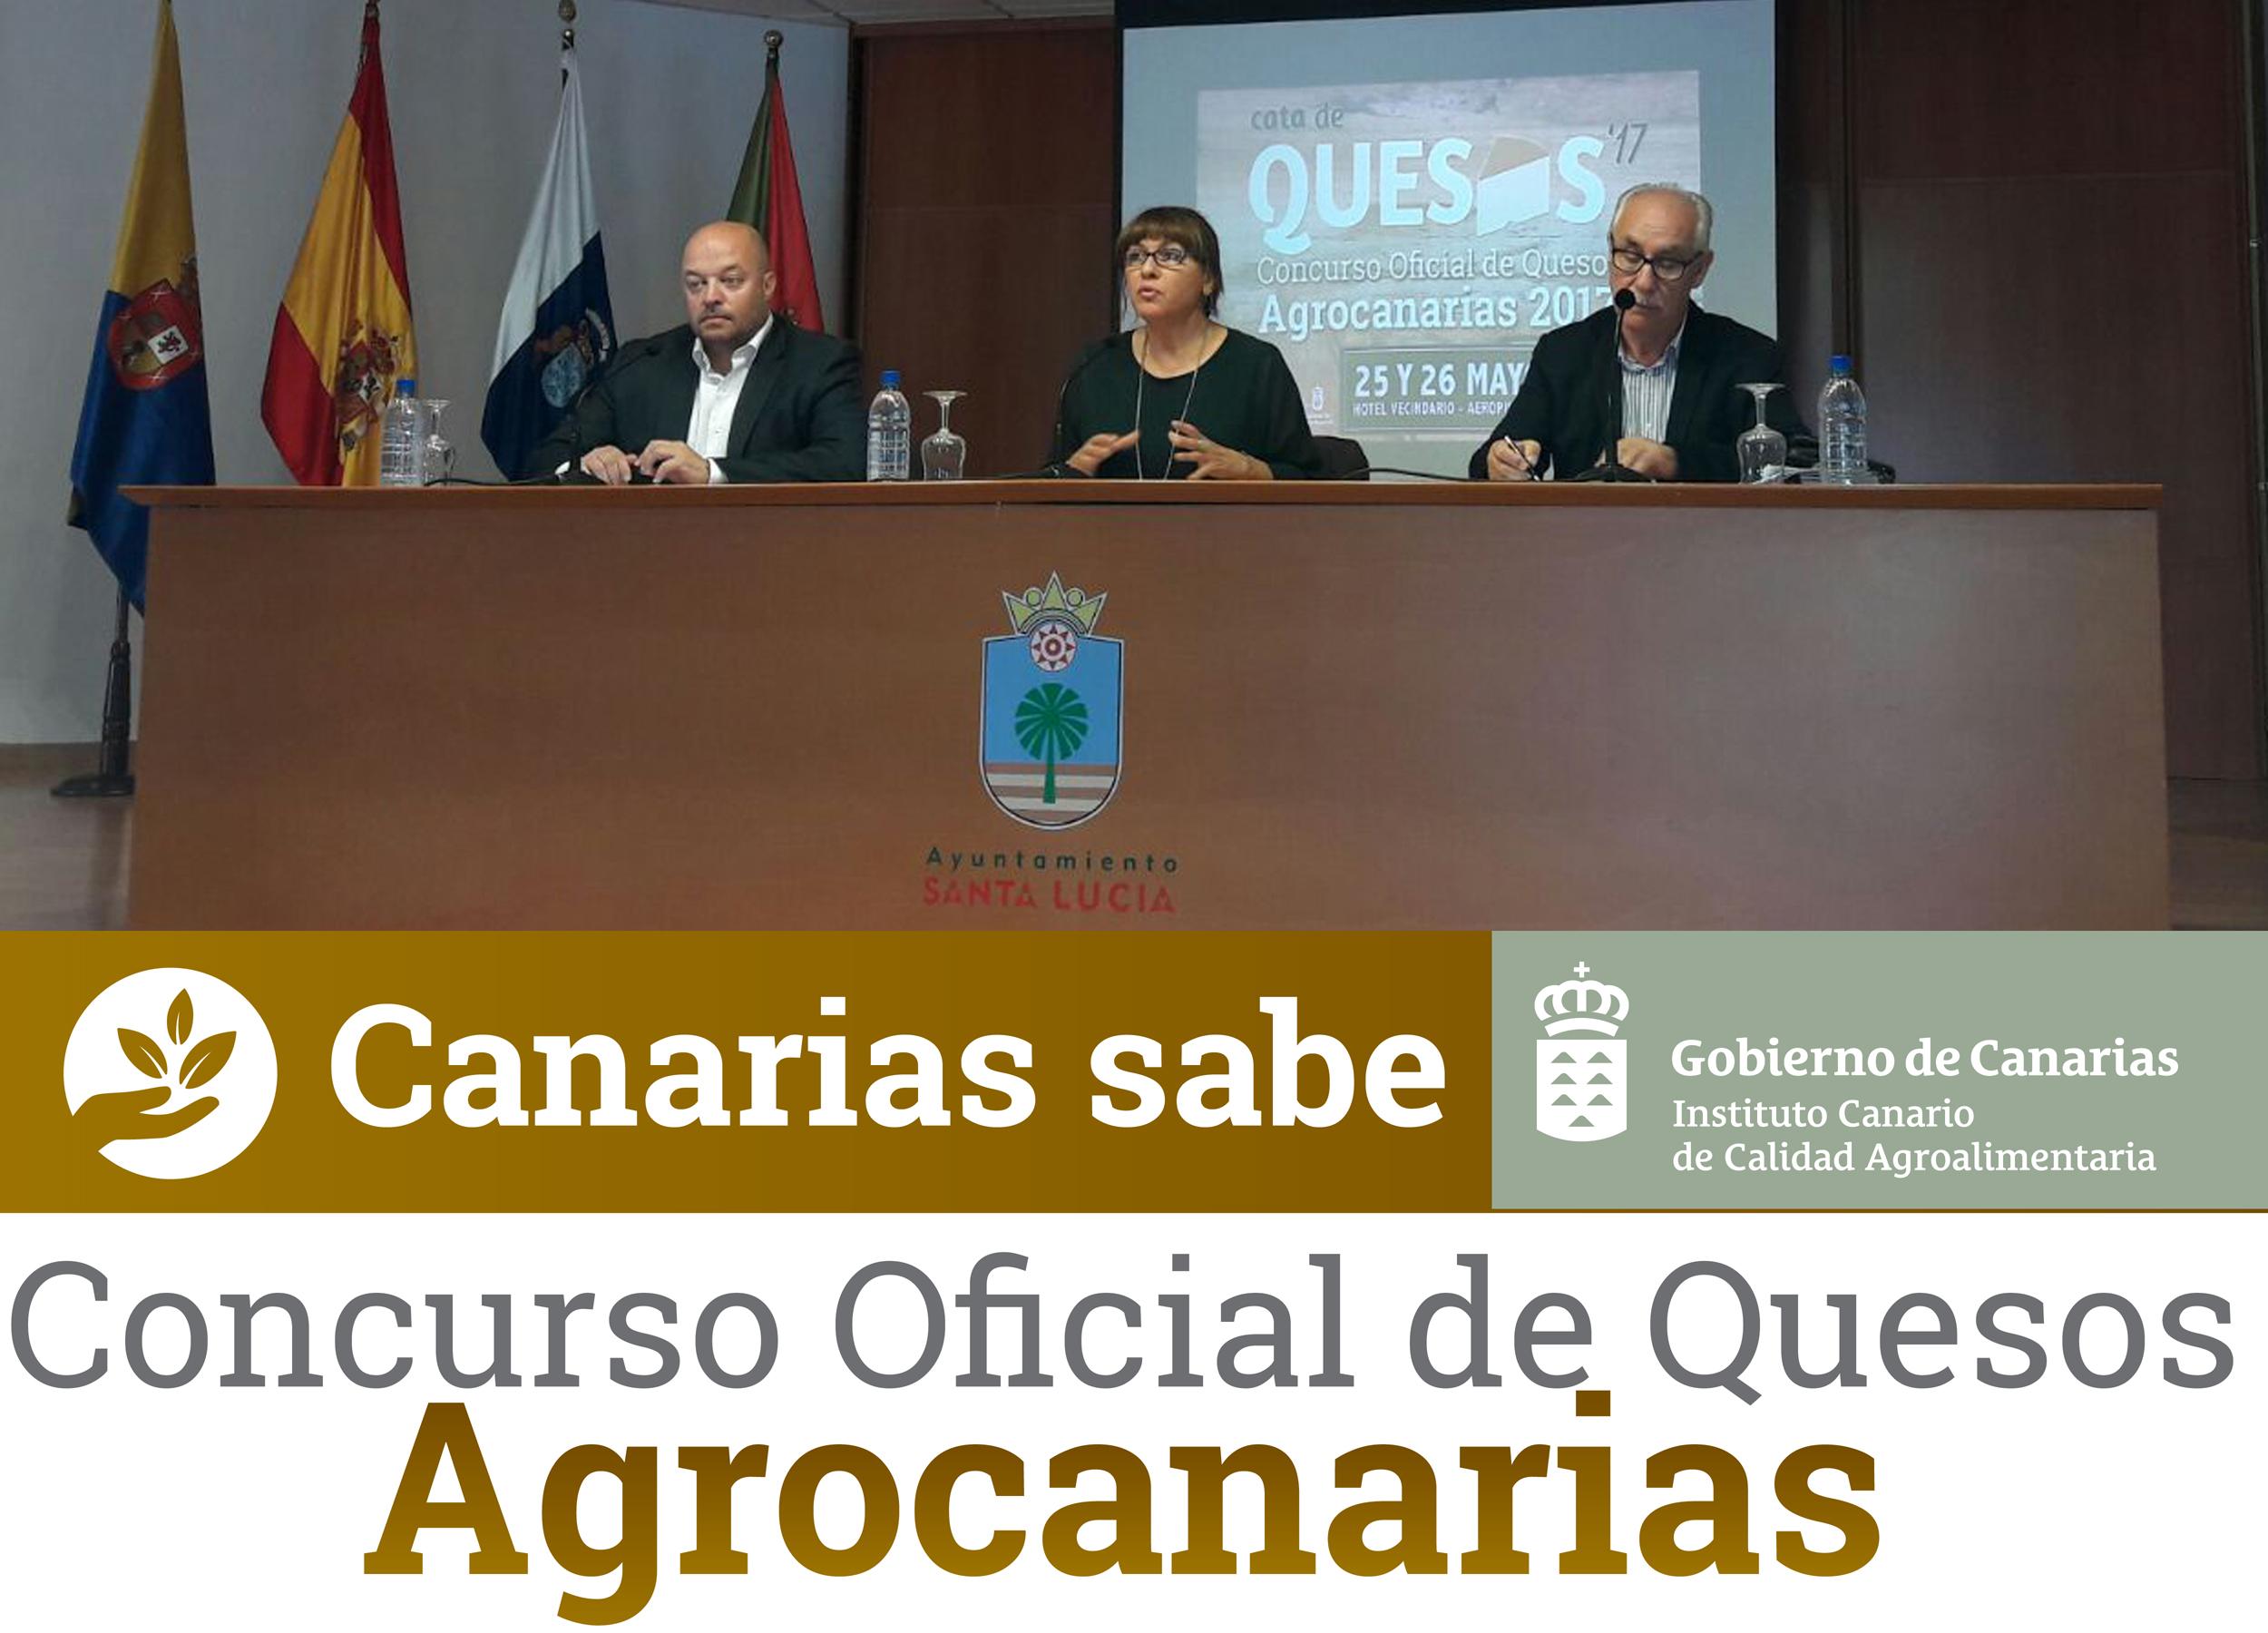 Concurso Oficial de Quesos Agrocanarias